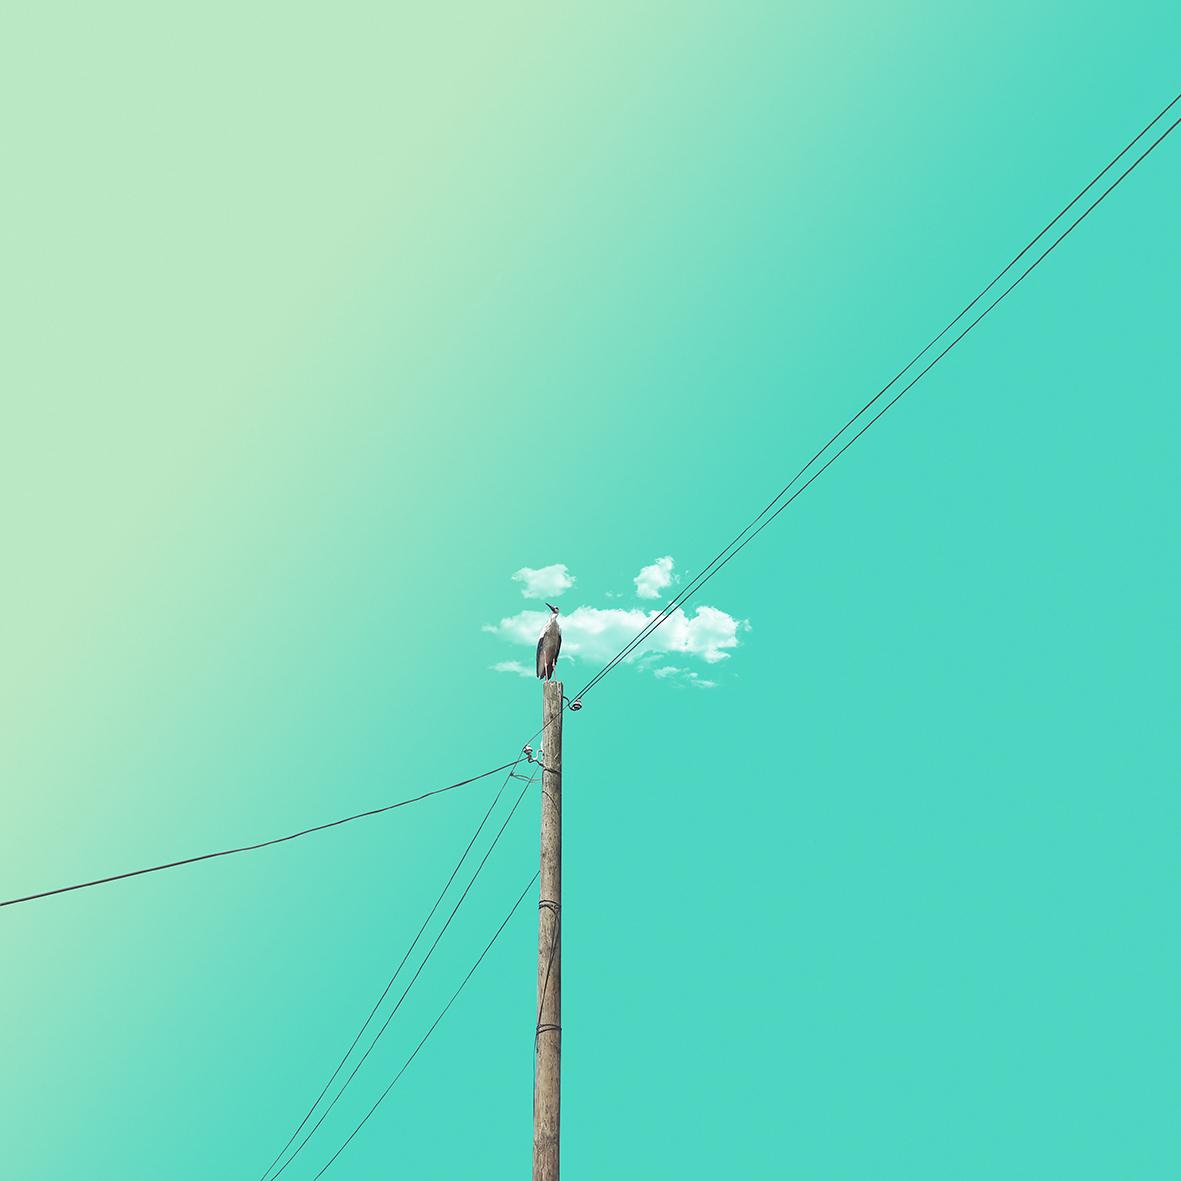 Lonly bird